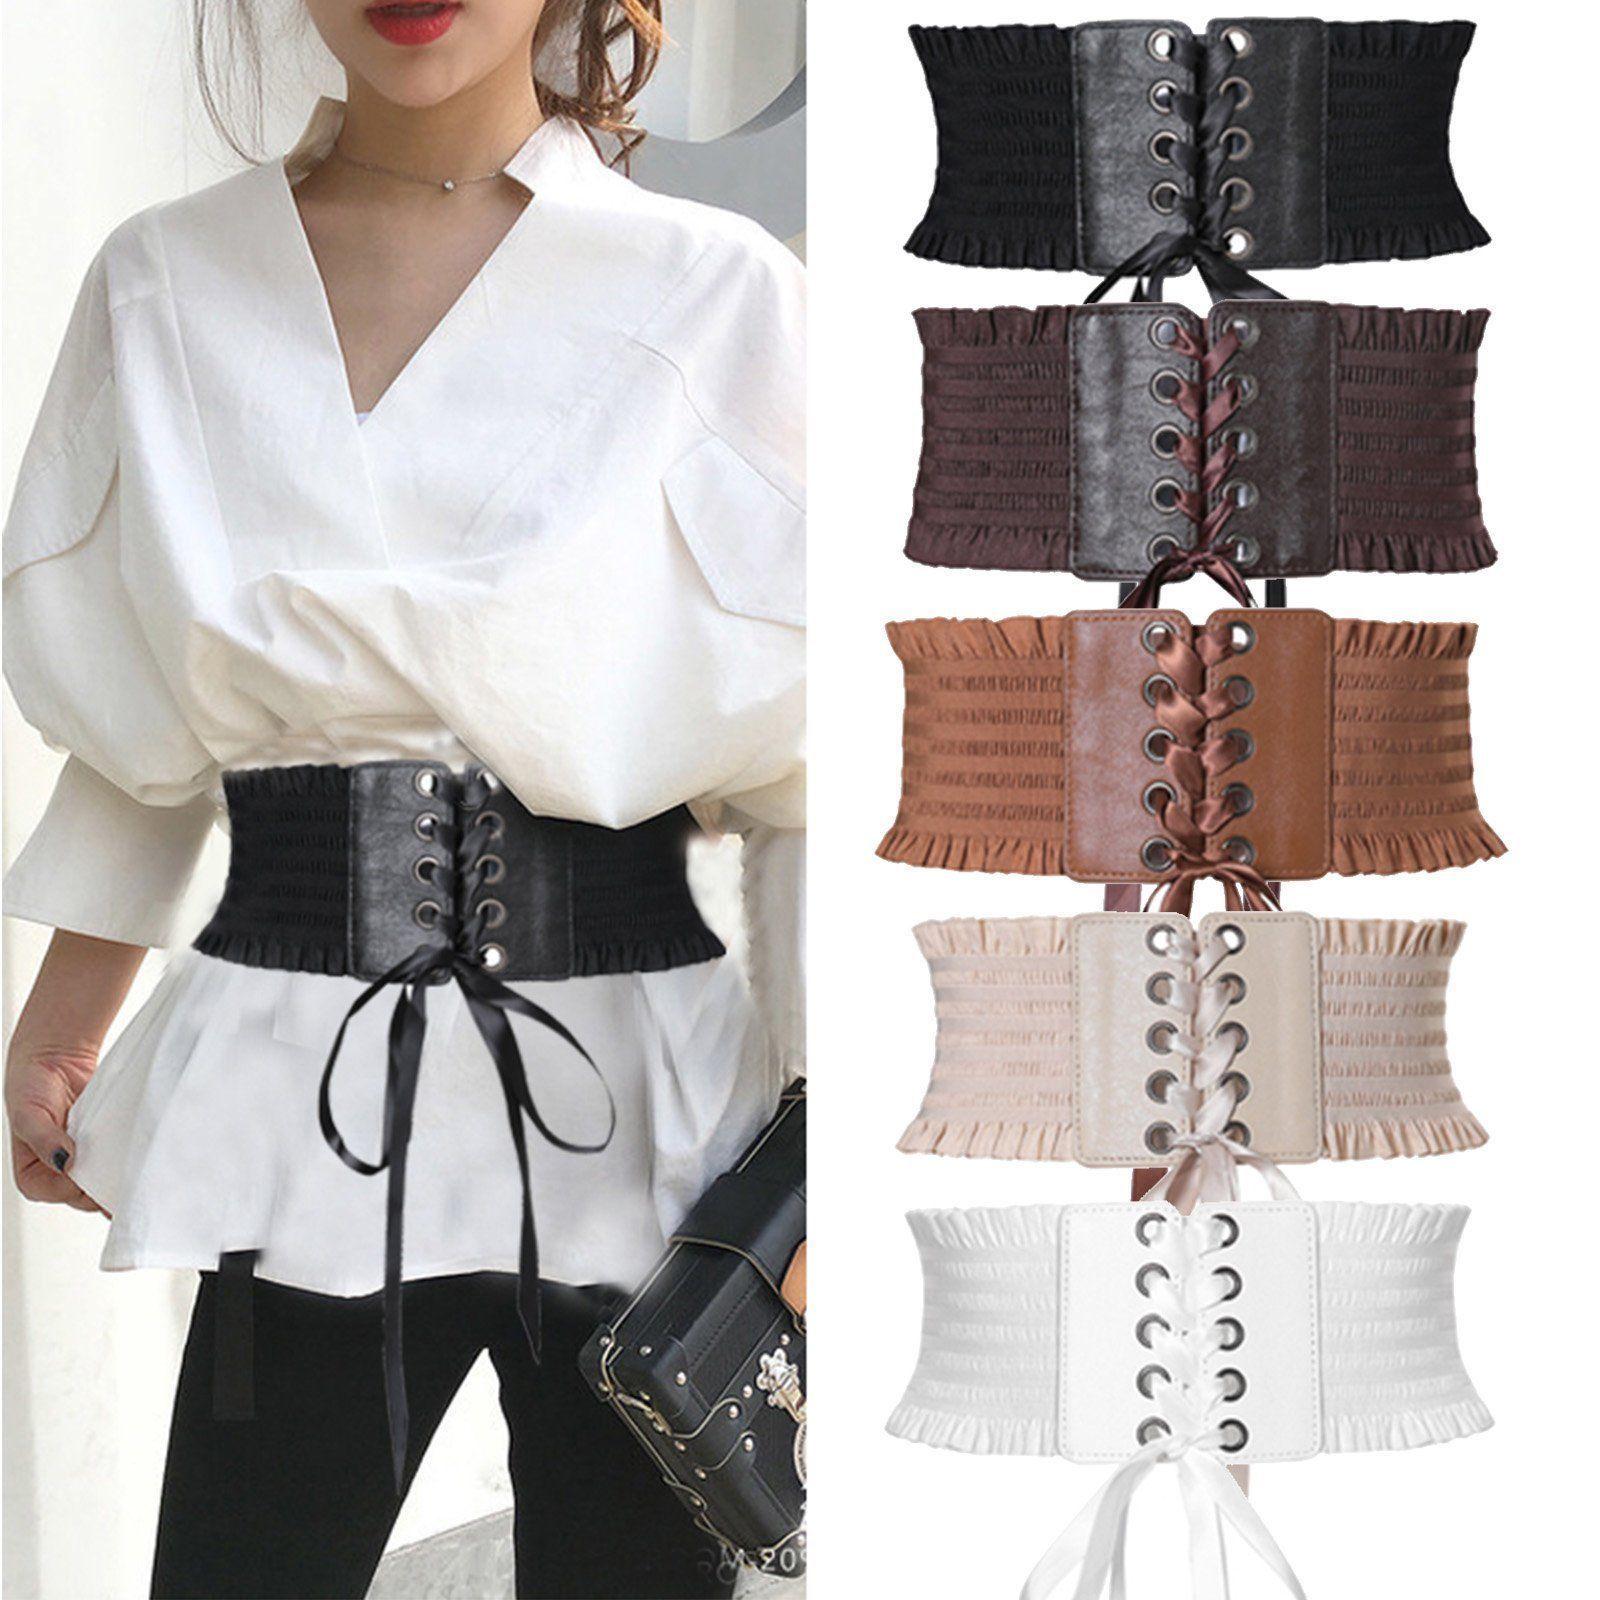 Women Leather Cinch Waist Wide Belt Ladies Fashion Wrap Elastic Buckle Wide Dress Corset Waistband